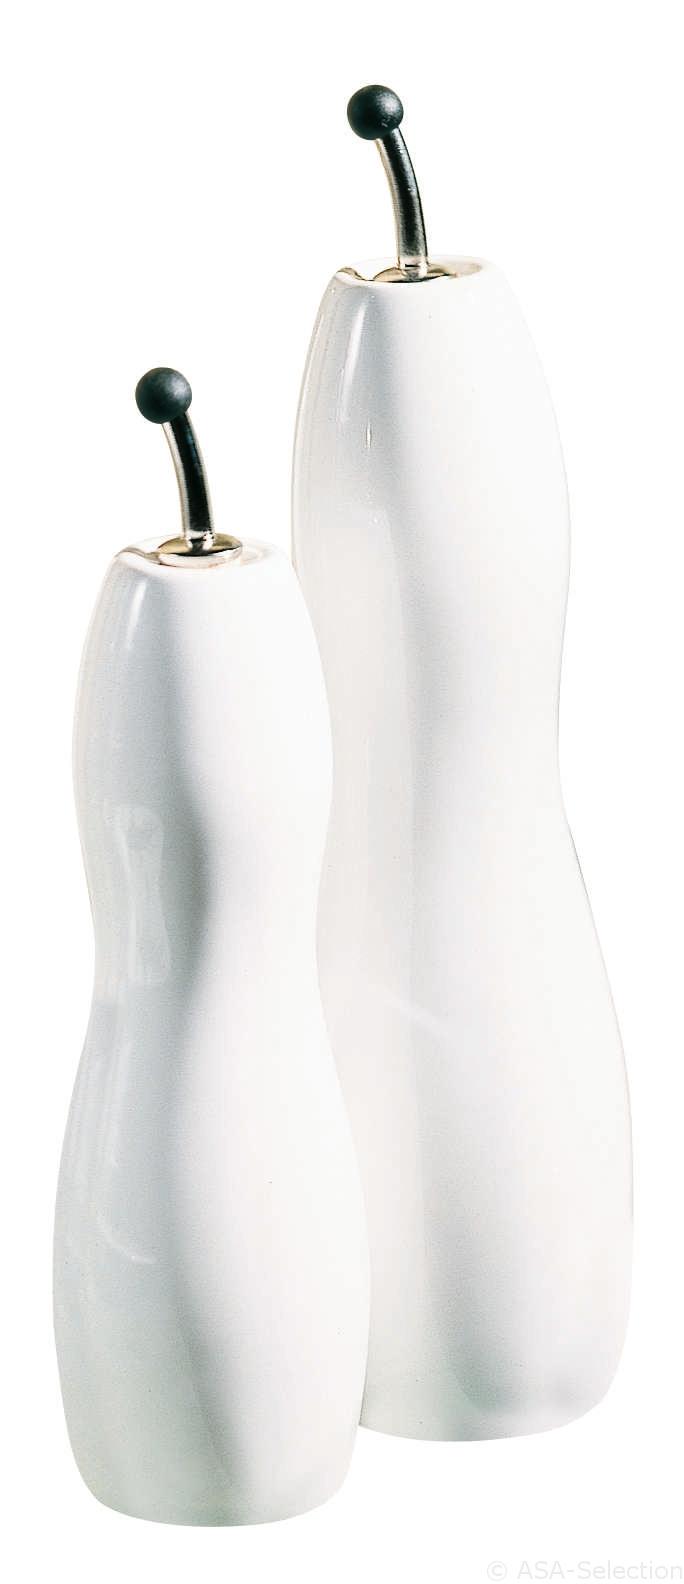 4751147 4752147 Grande - Sticlă pt oțet/ulei din porțelan Kitchen (4752147)